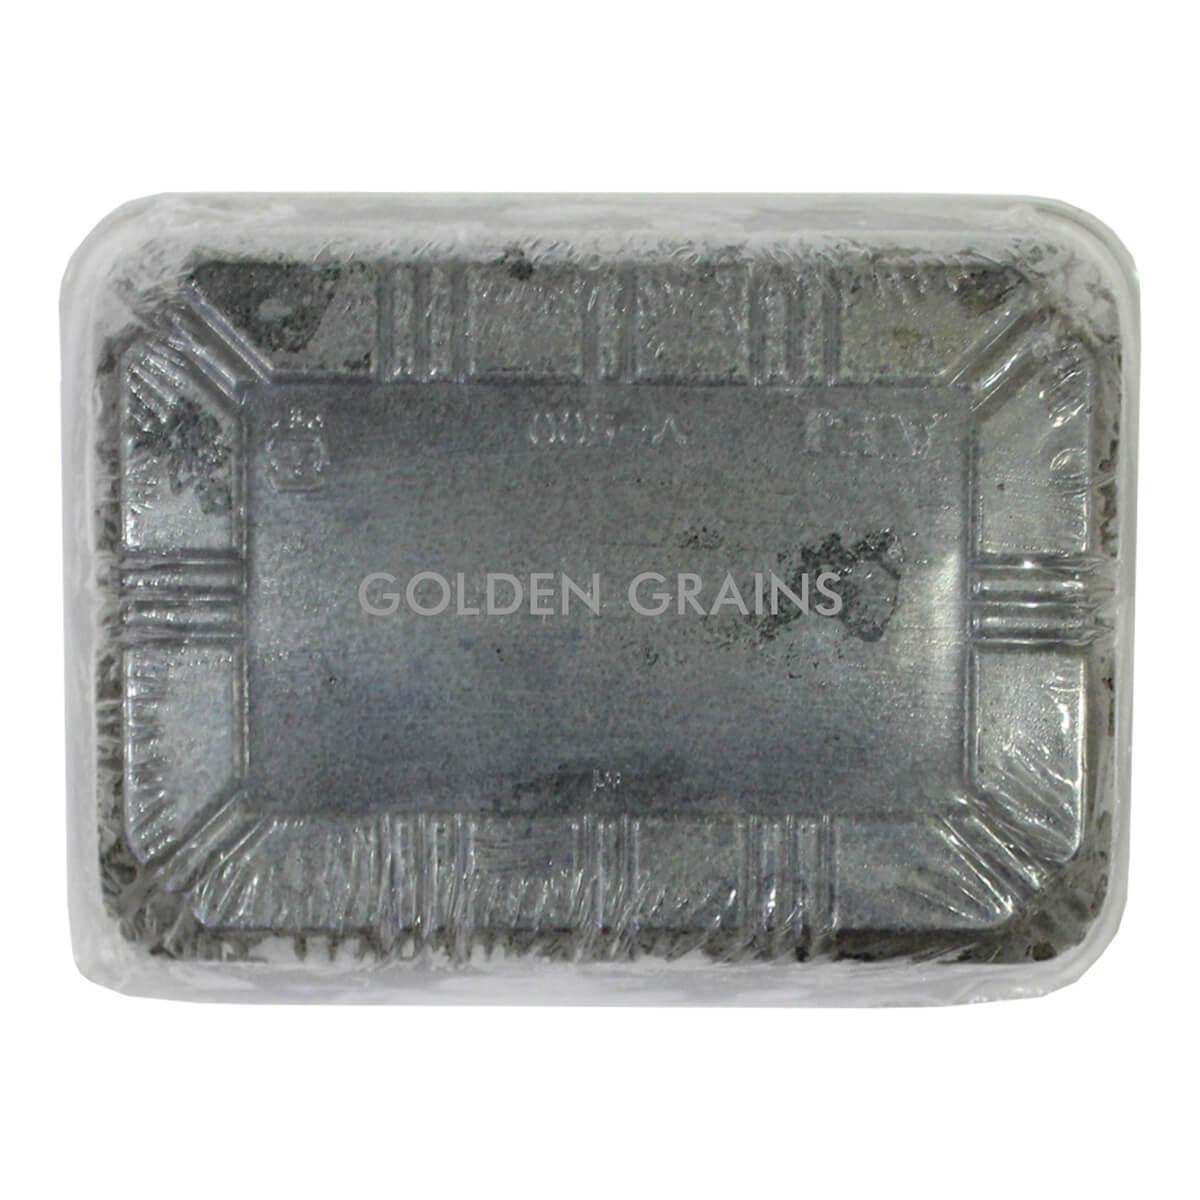 Golden Grains Azuma Foods - Masago Black - Back.jpg